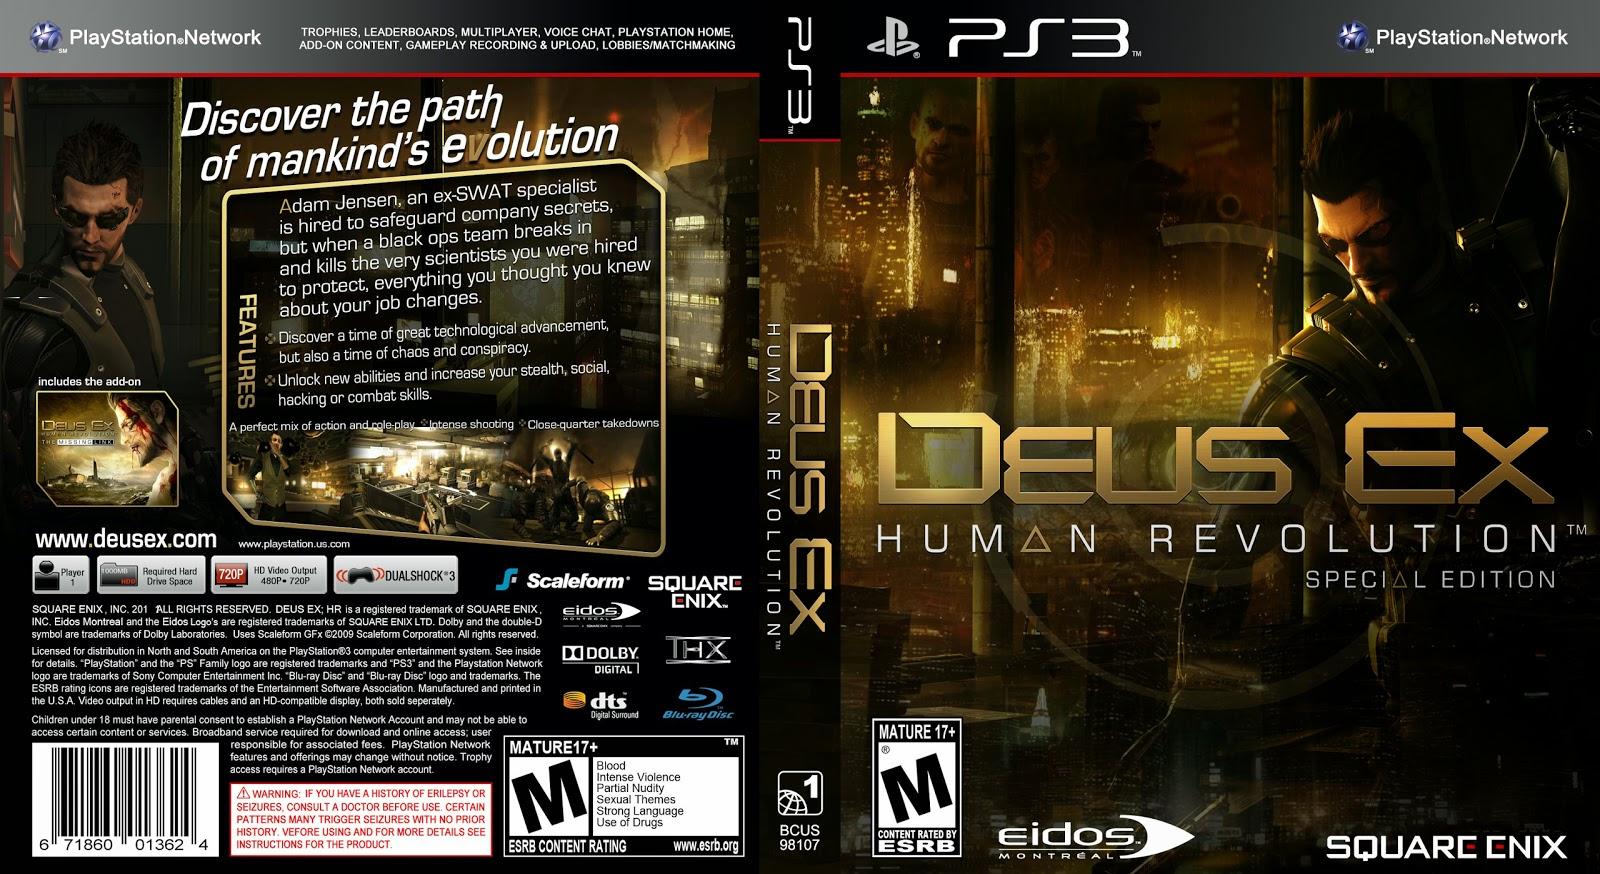 Capa DVD Deus Ex Human Revolution Special Edition PS3